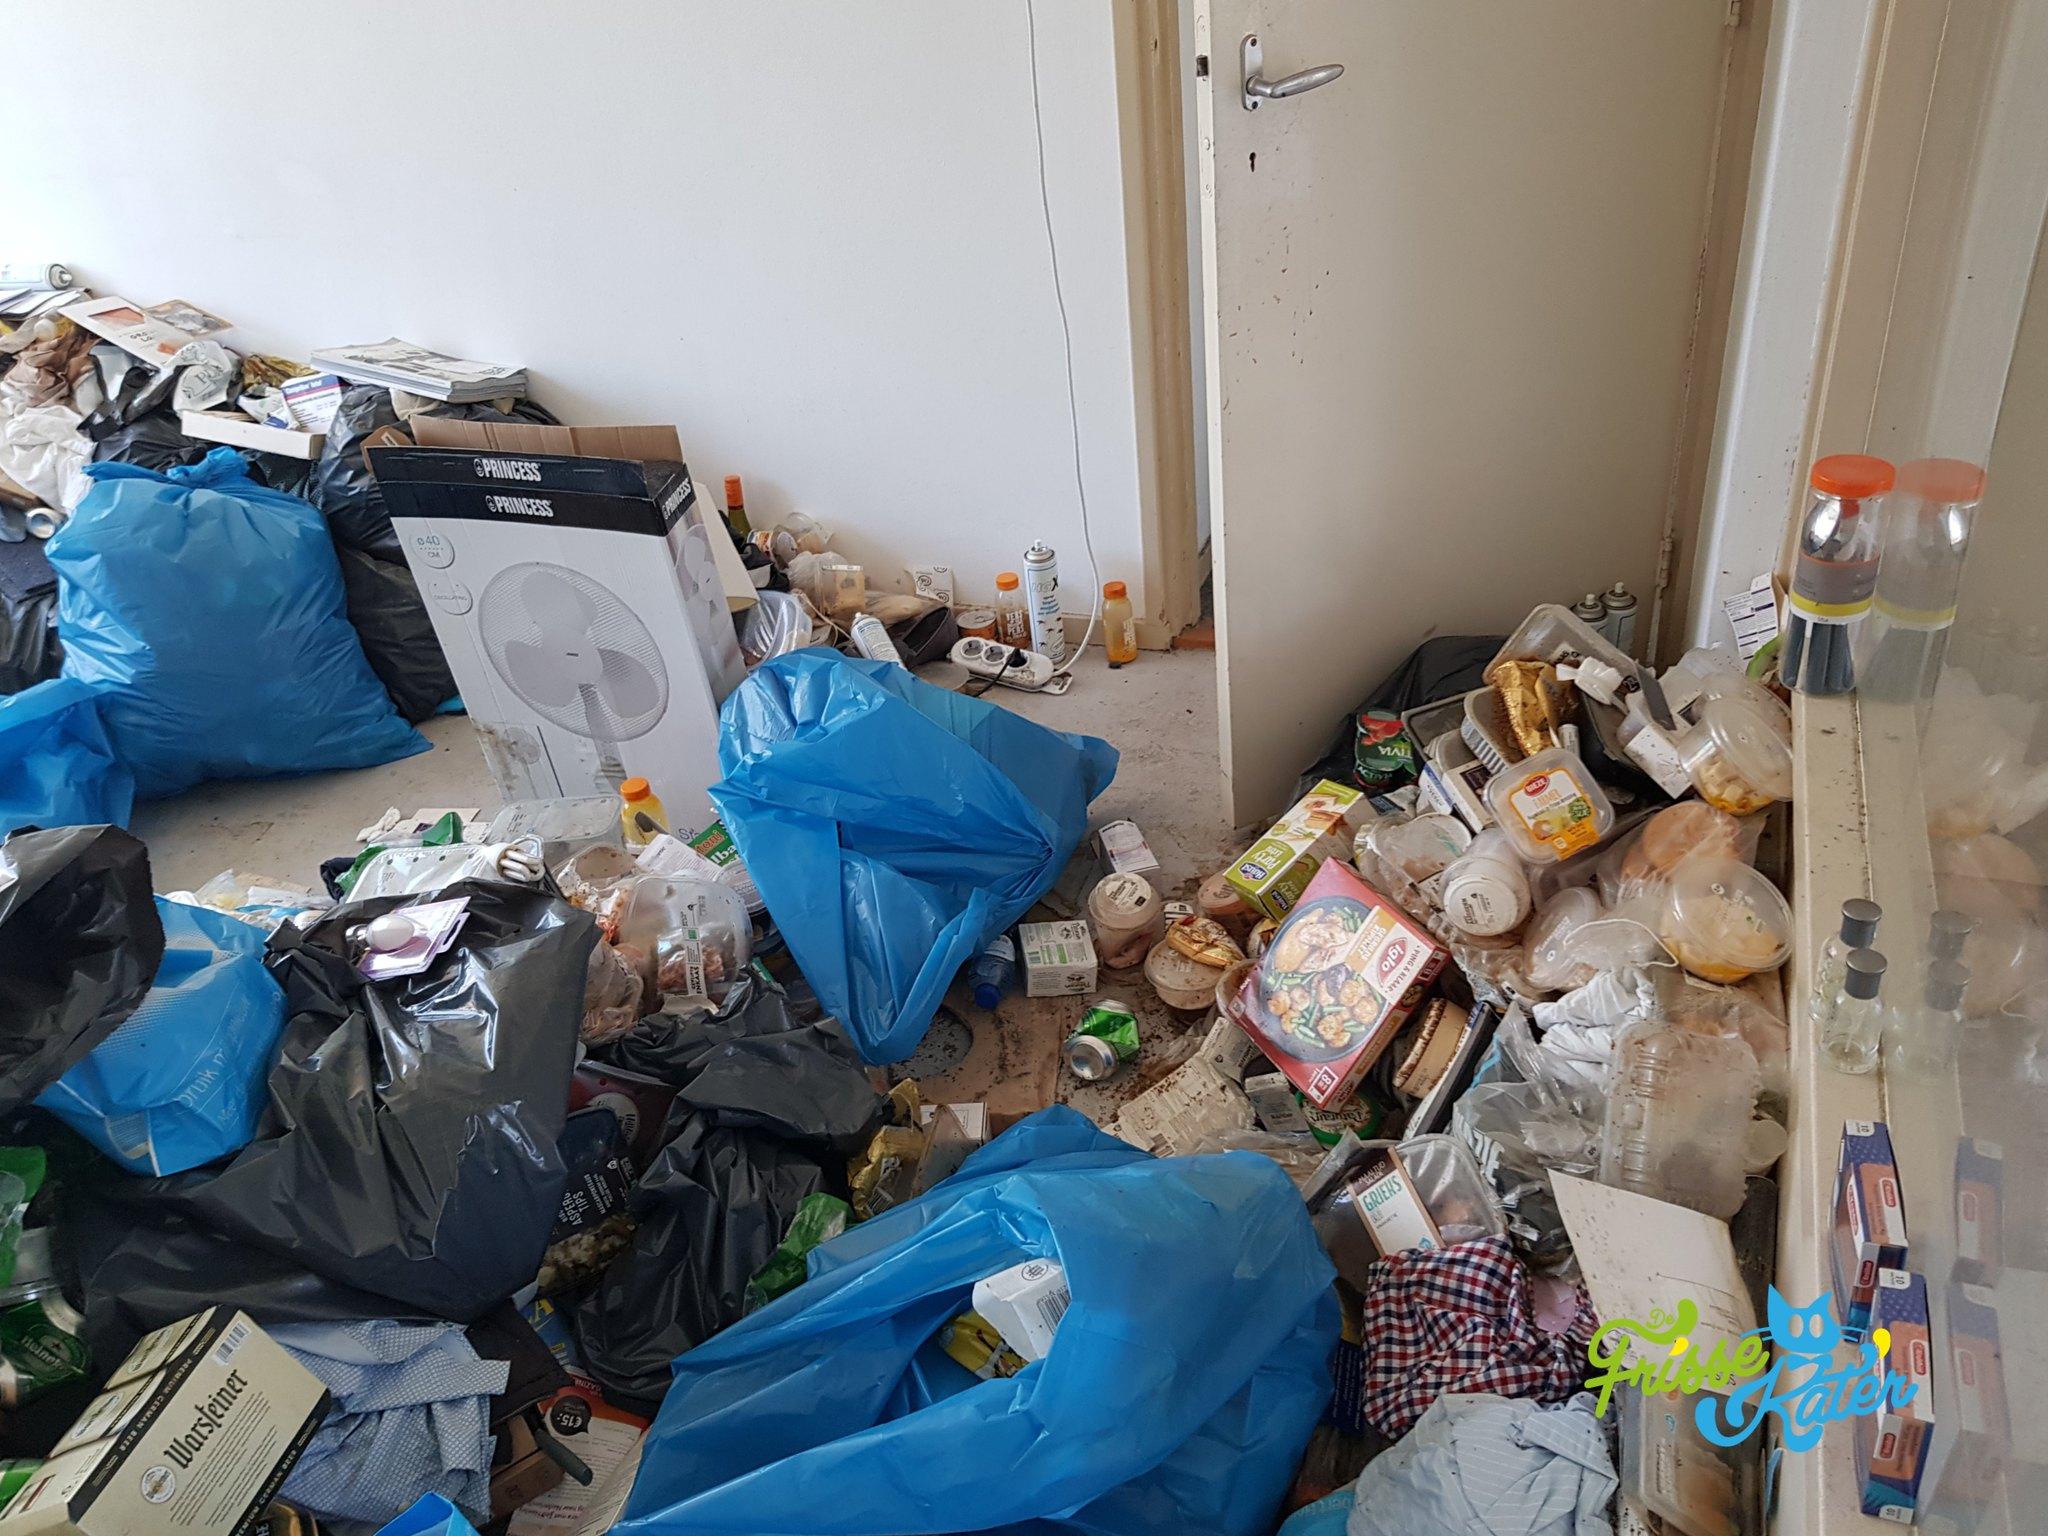 verzamelwoede schoonmaak